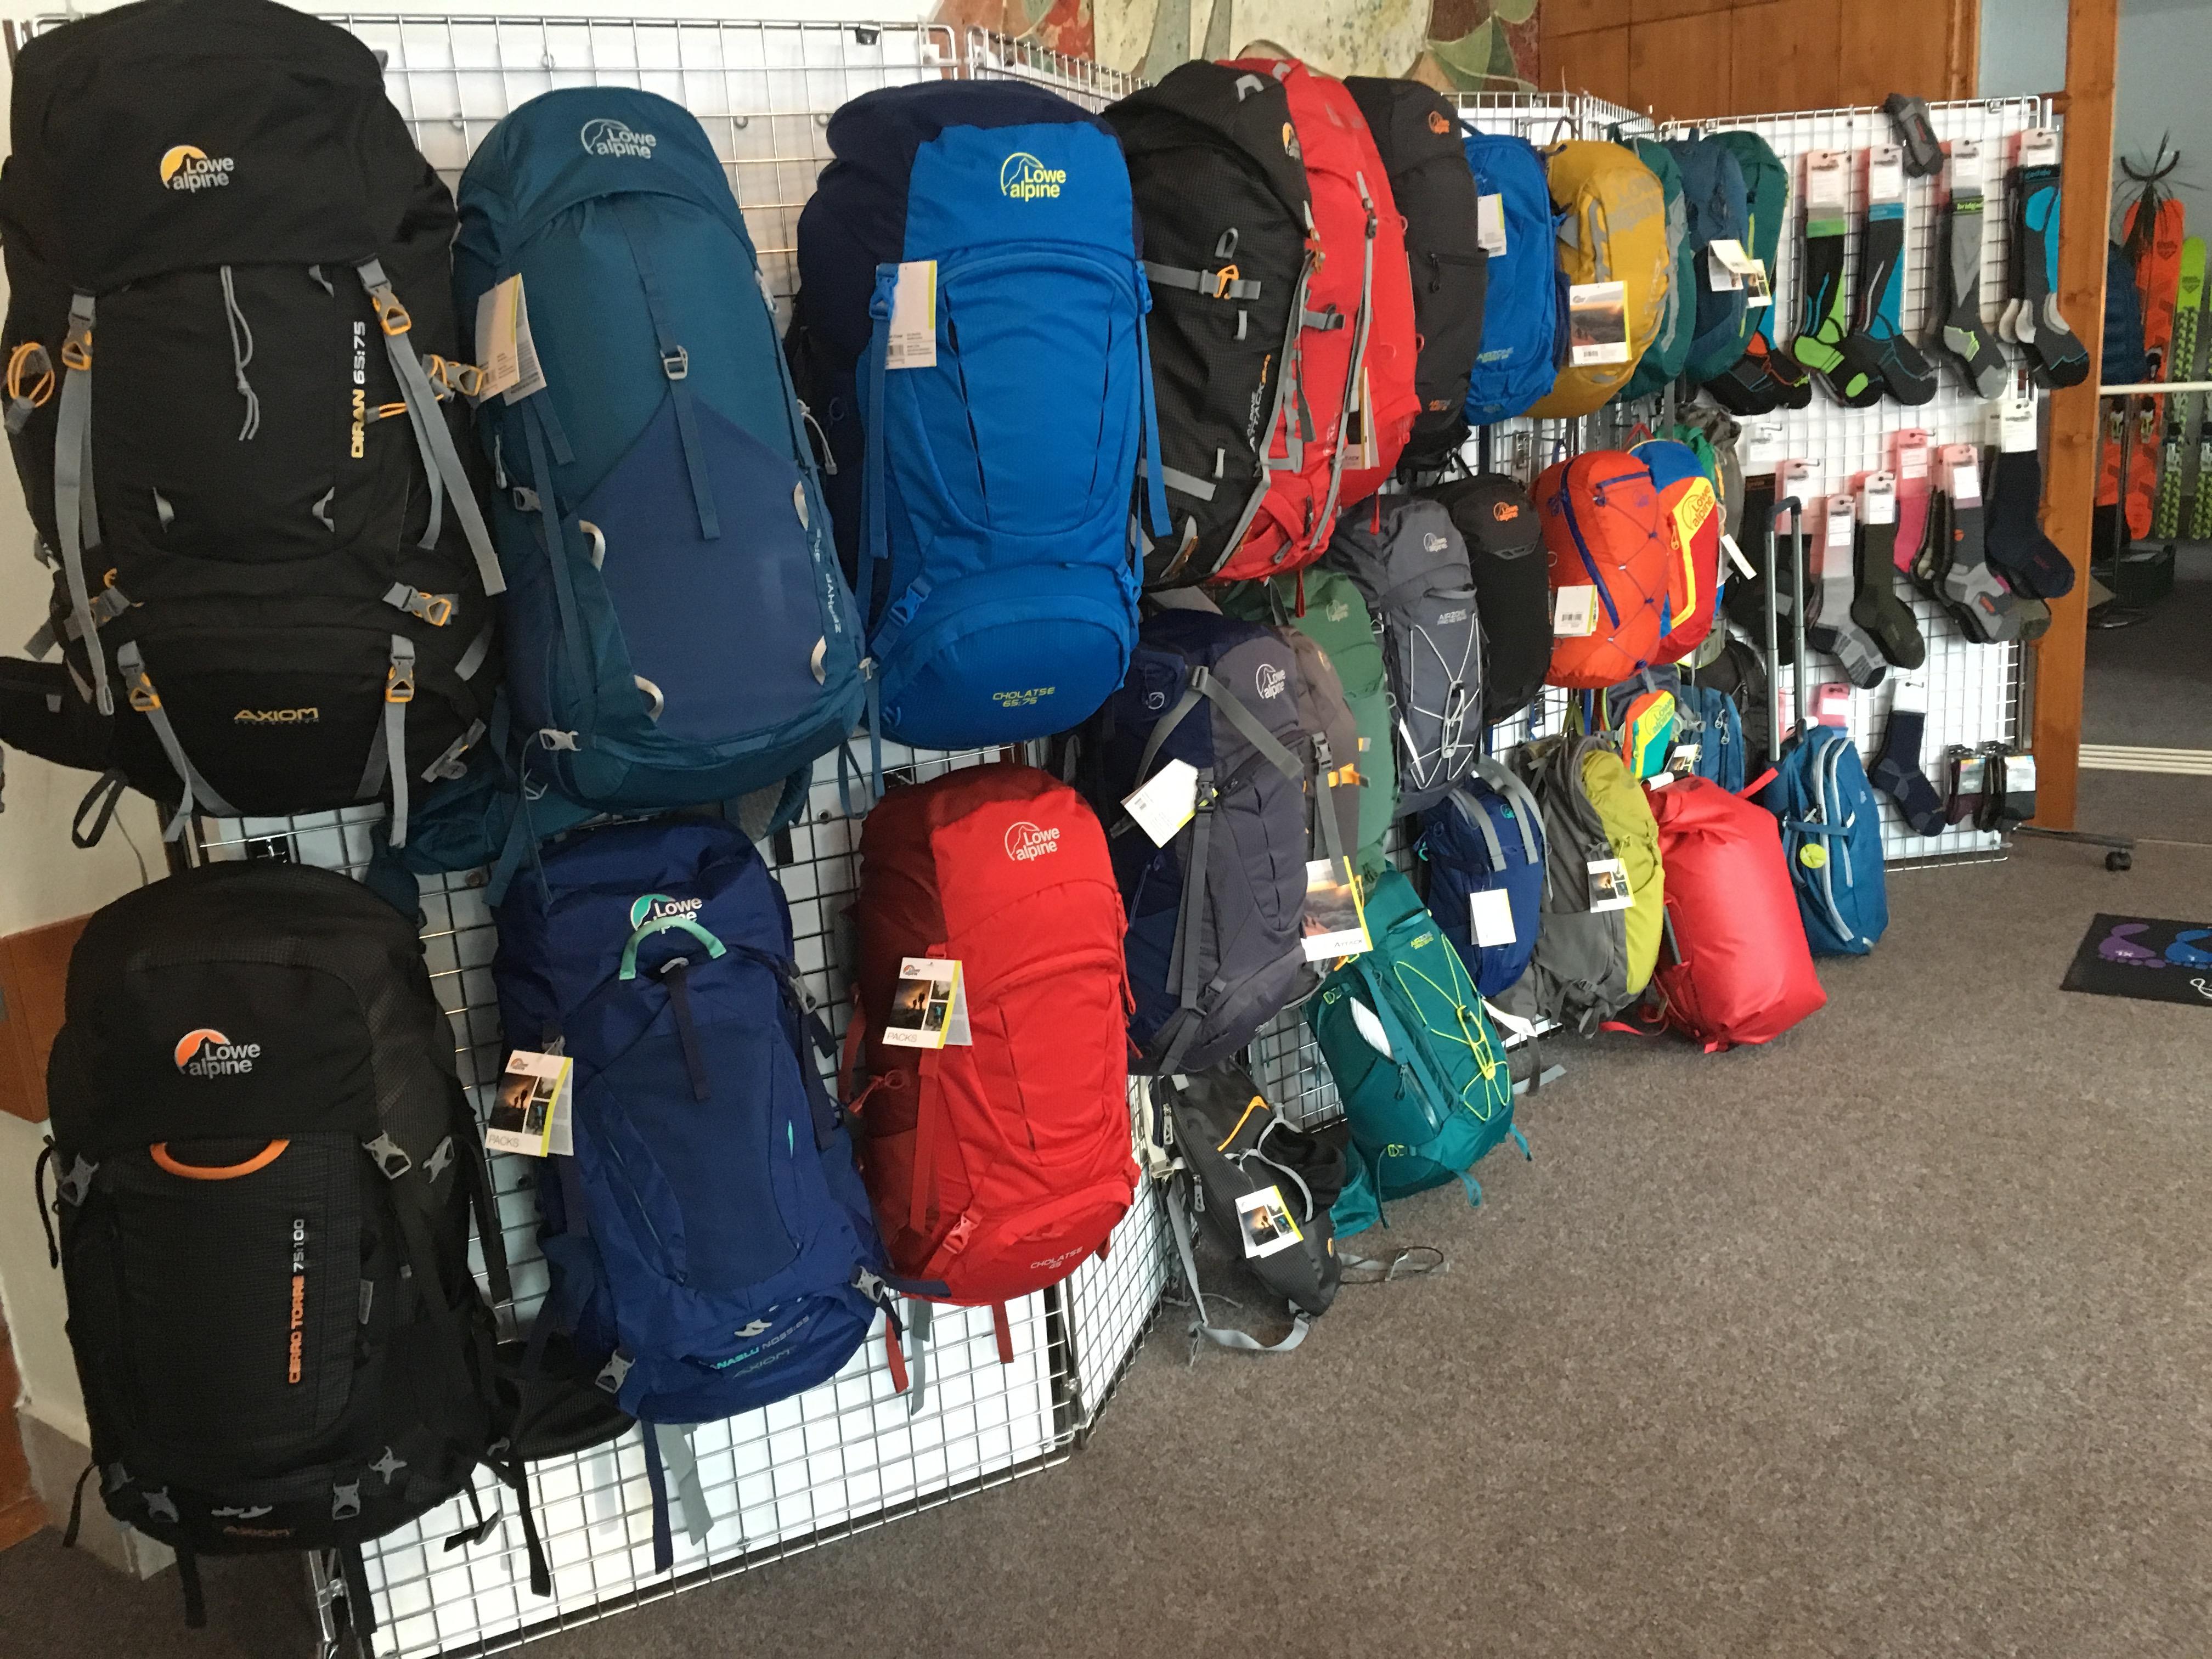 Outdoor výstava 2016 a Alpine Lowe ruksaky